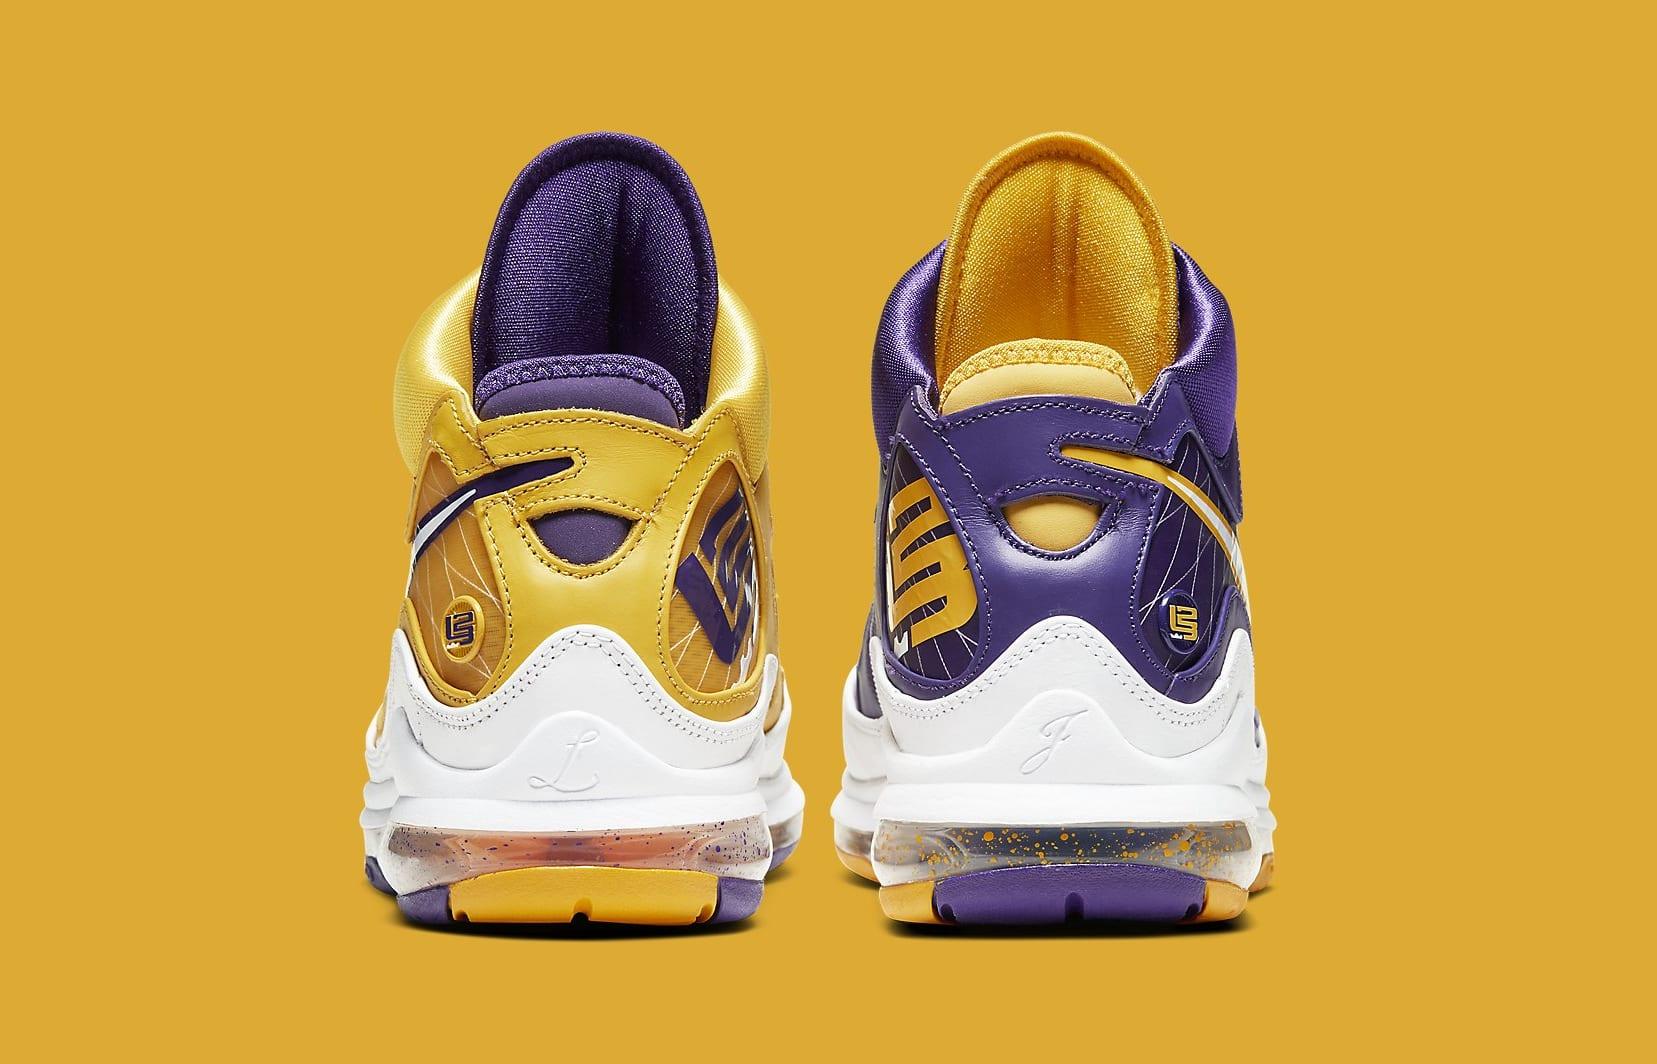 Nike LeBron 7 'Lakers' CW2300-500 Heel